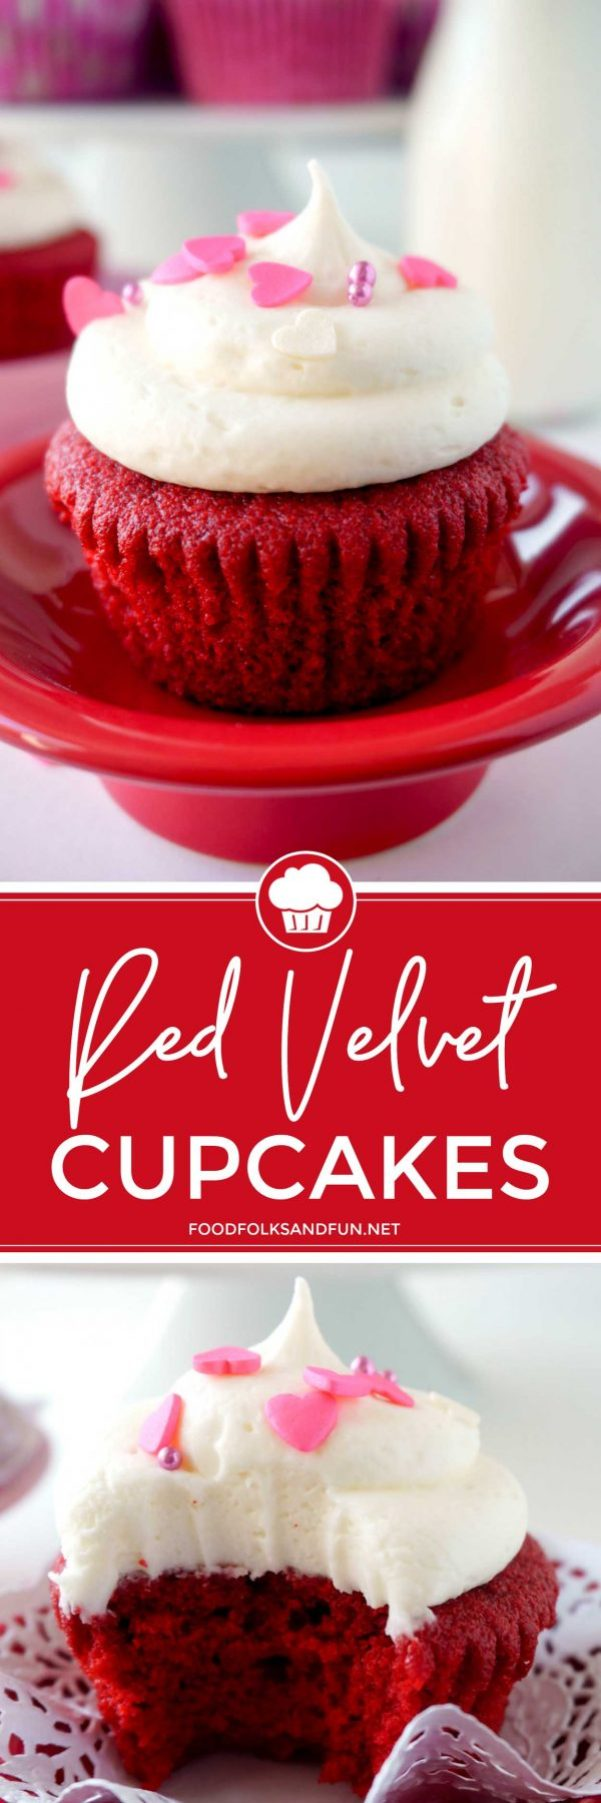 Red Velvet Cupcake recipe for Valentine's Day